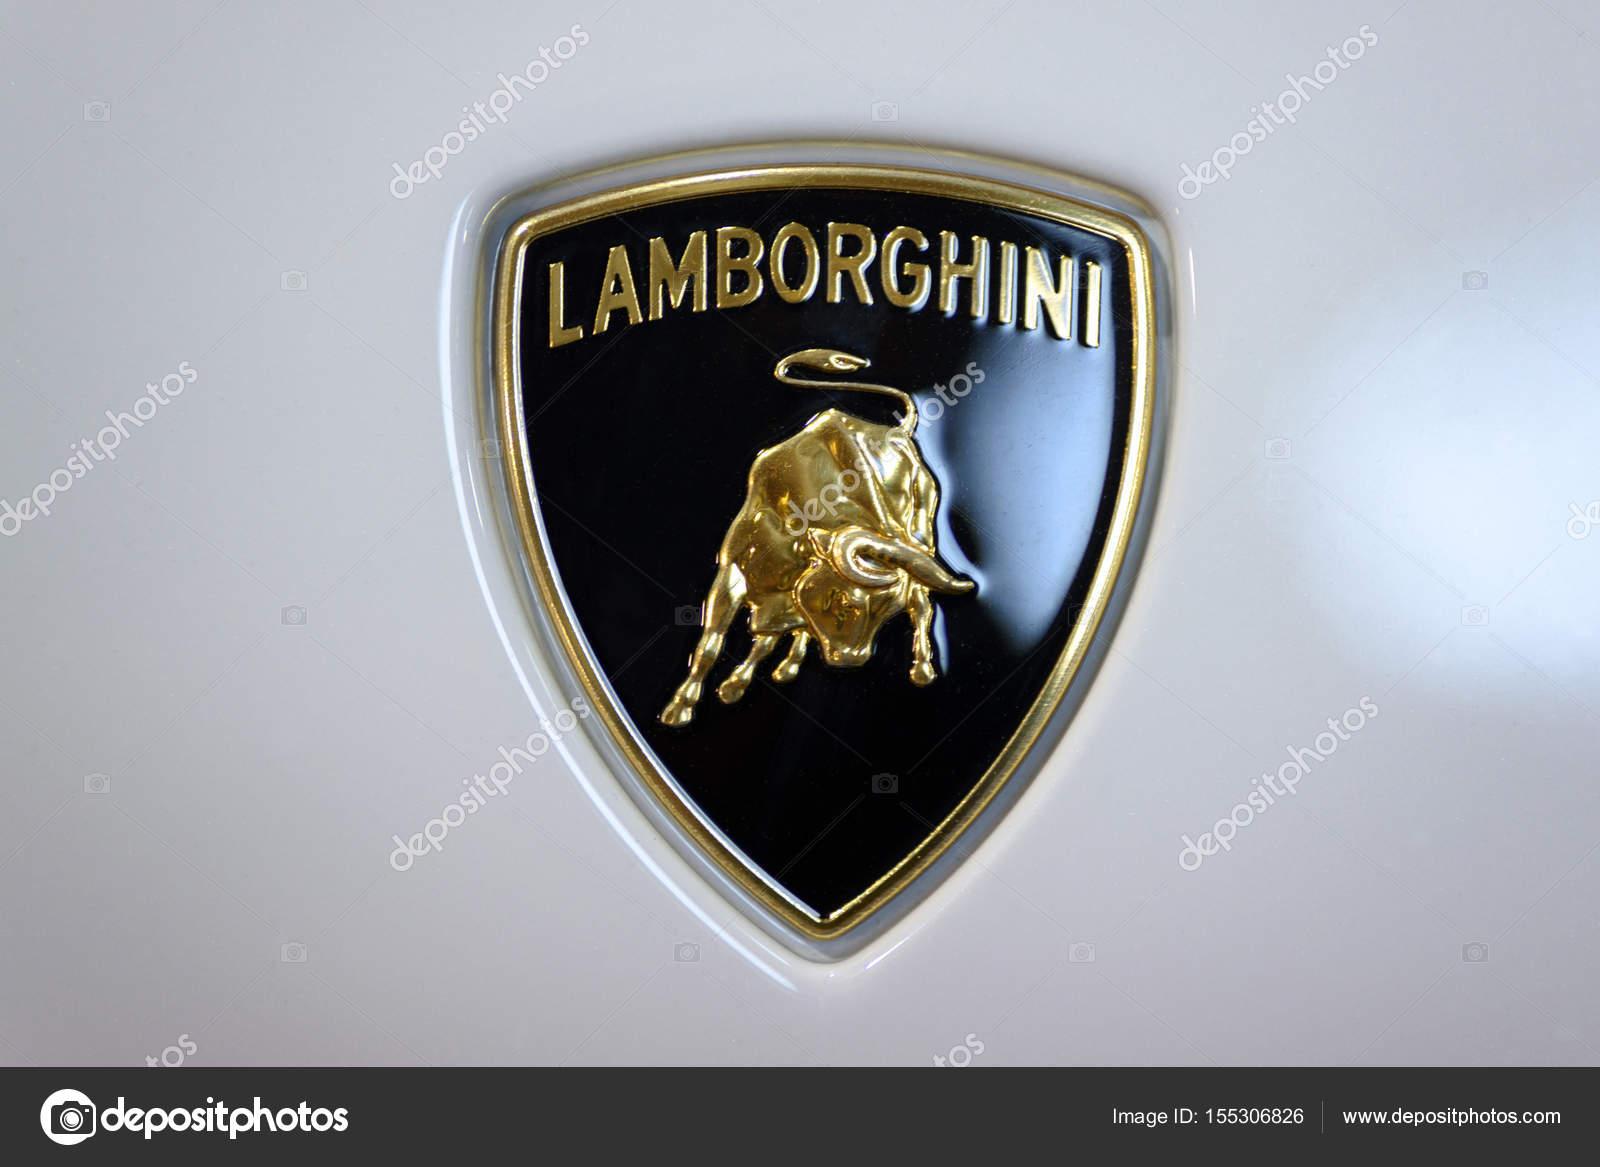 Lamborghini Car Sign Stock Editorial Photo C Wdnet 155306826